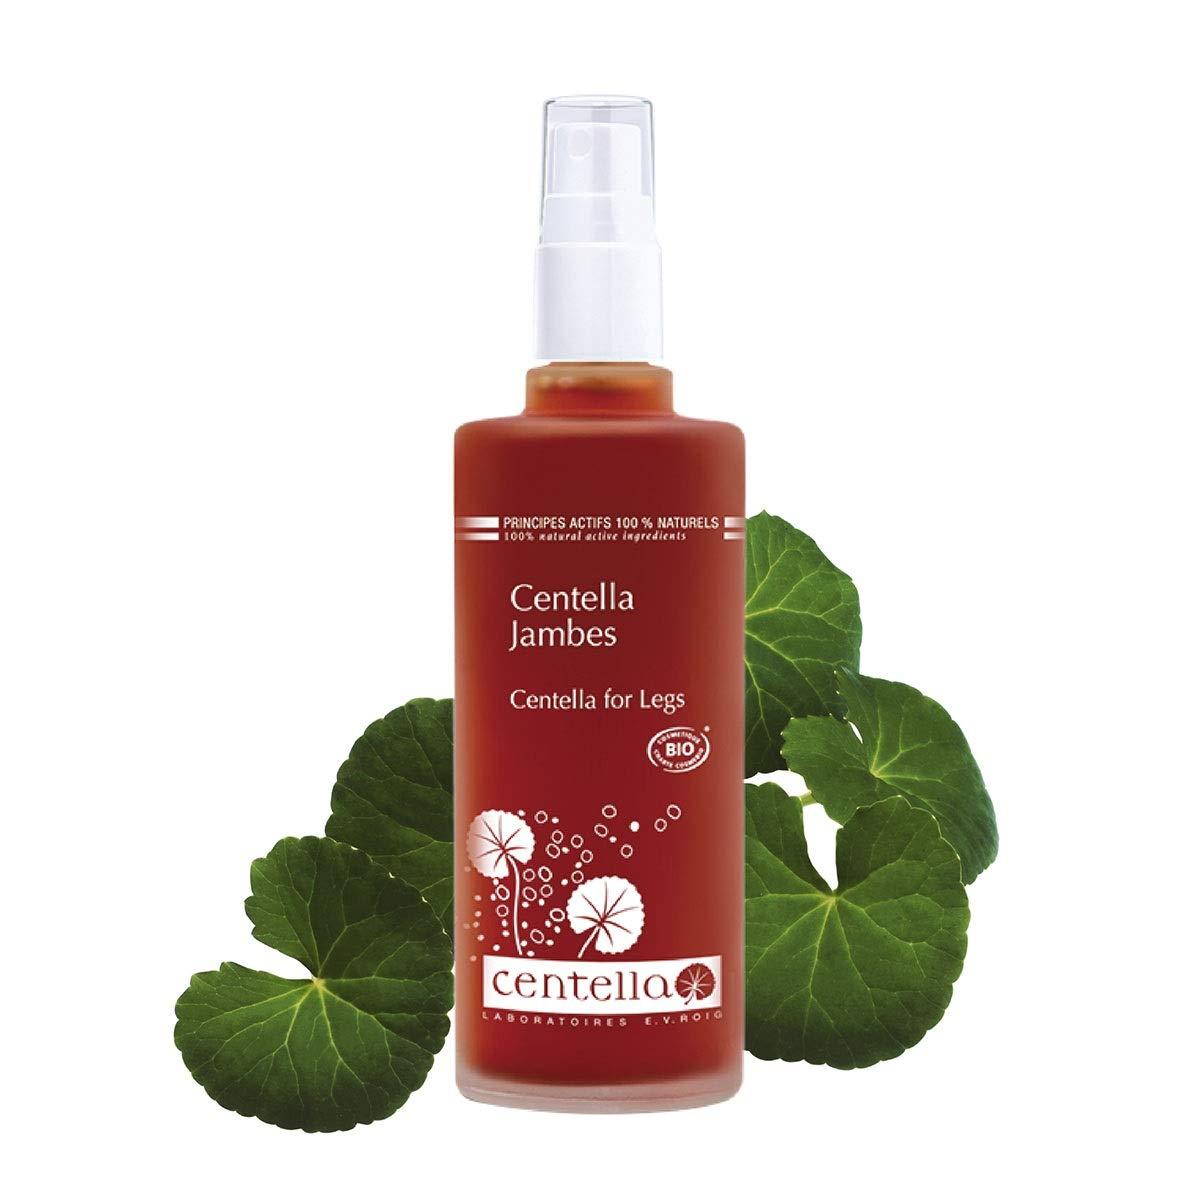 Centella for Legs   ECOCERT Organic Certified Leg Serum   65% Centella Asiatica for Leg Tightening, Body Relaxation & Circulation, Sports & High Heel Relaxing Spray Leg Tightening Body   125ml